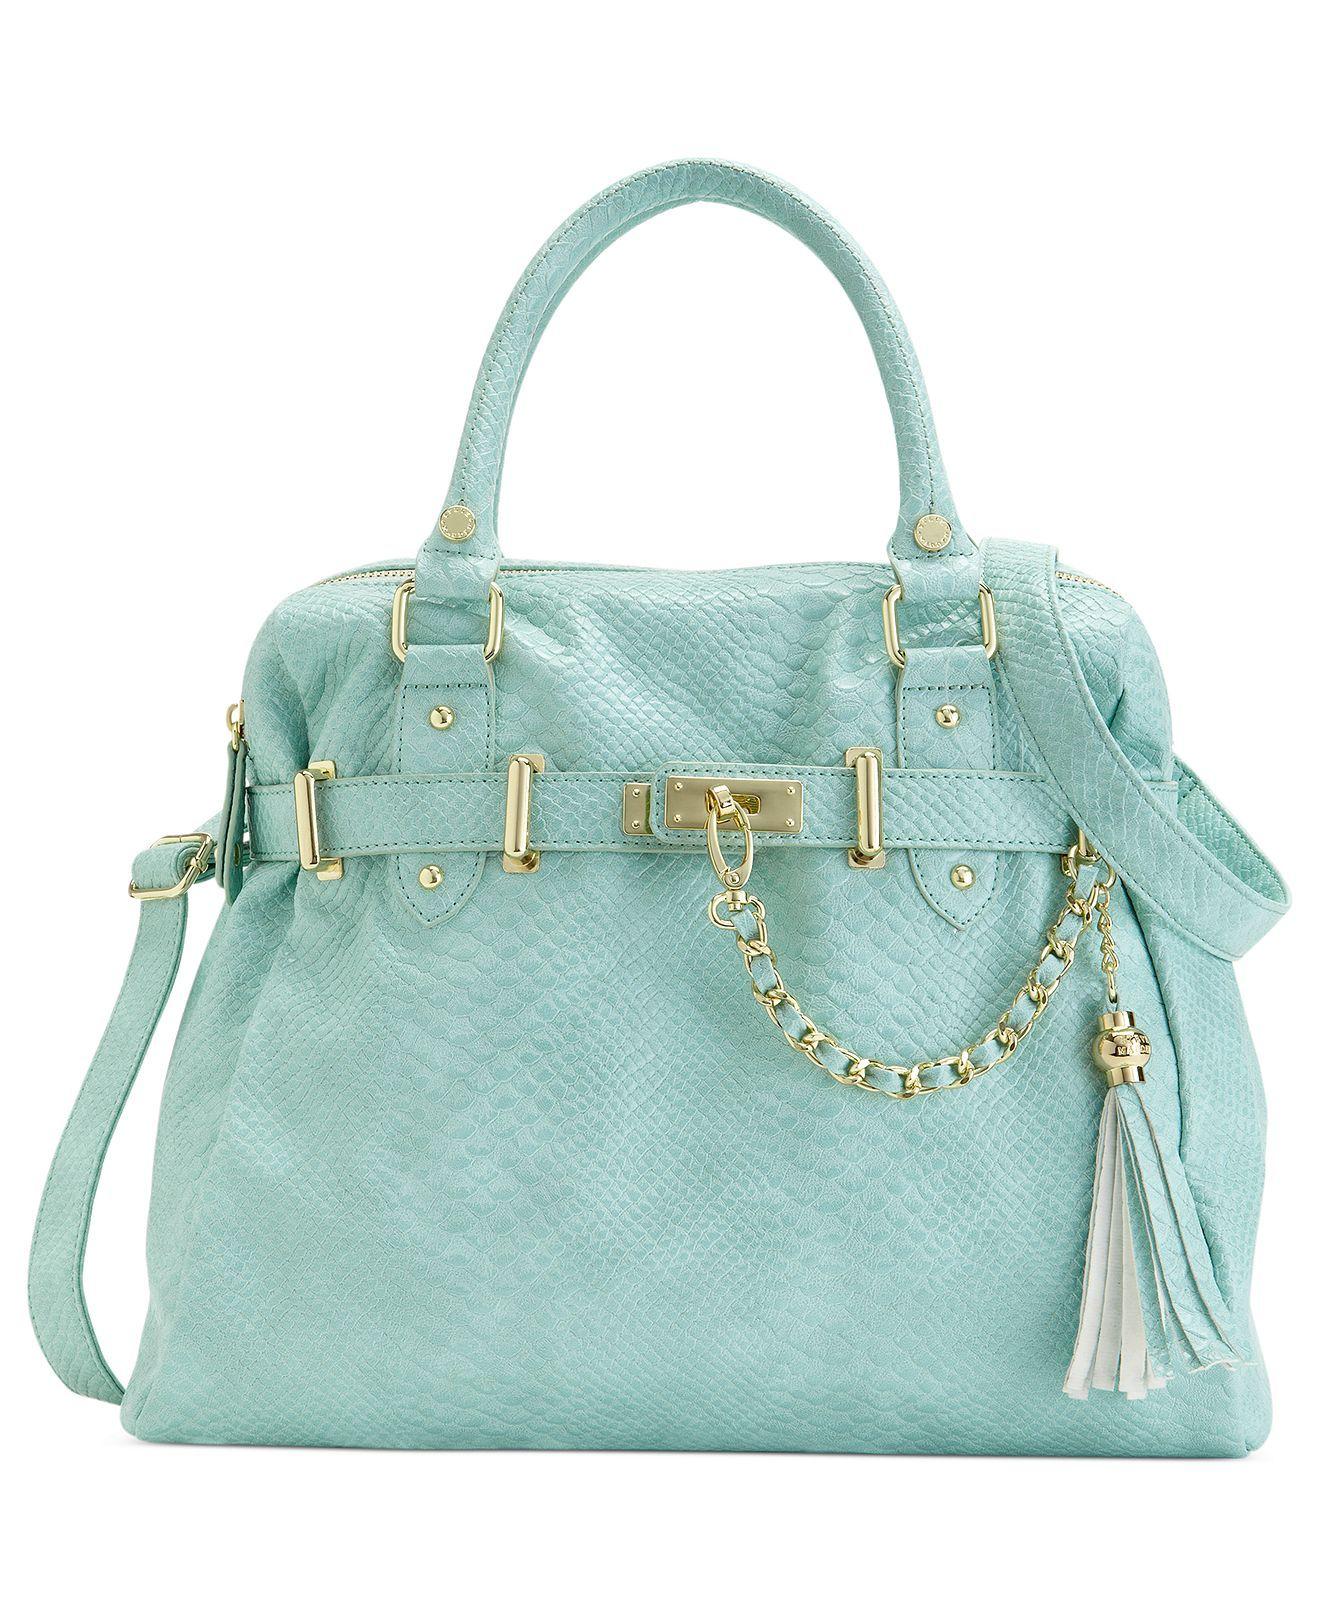 f1bcddf7535 Steve Madden Handbag, Bnancy Snake Satchel - Steve Madden - Handbags &  Accessories - Macy's